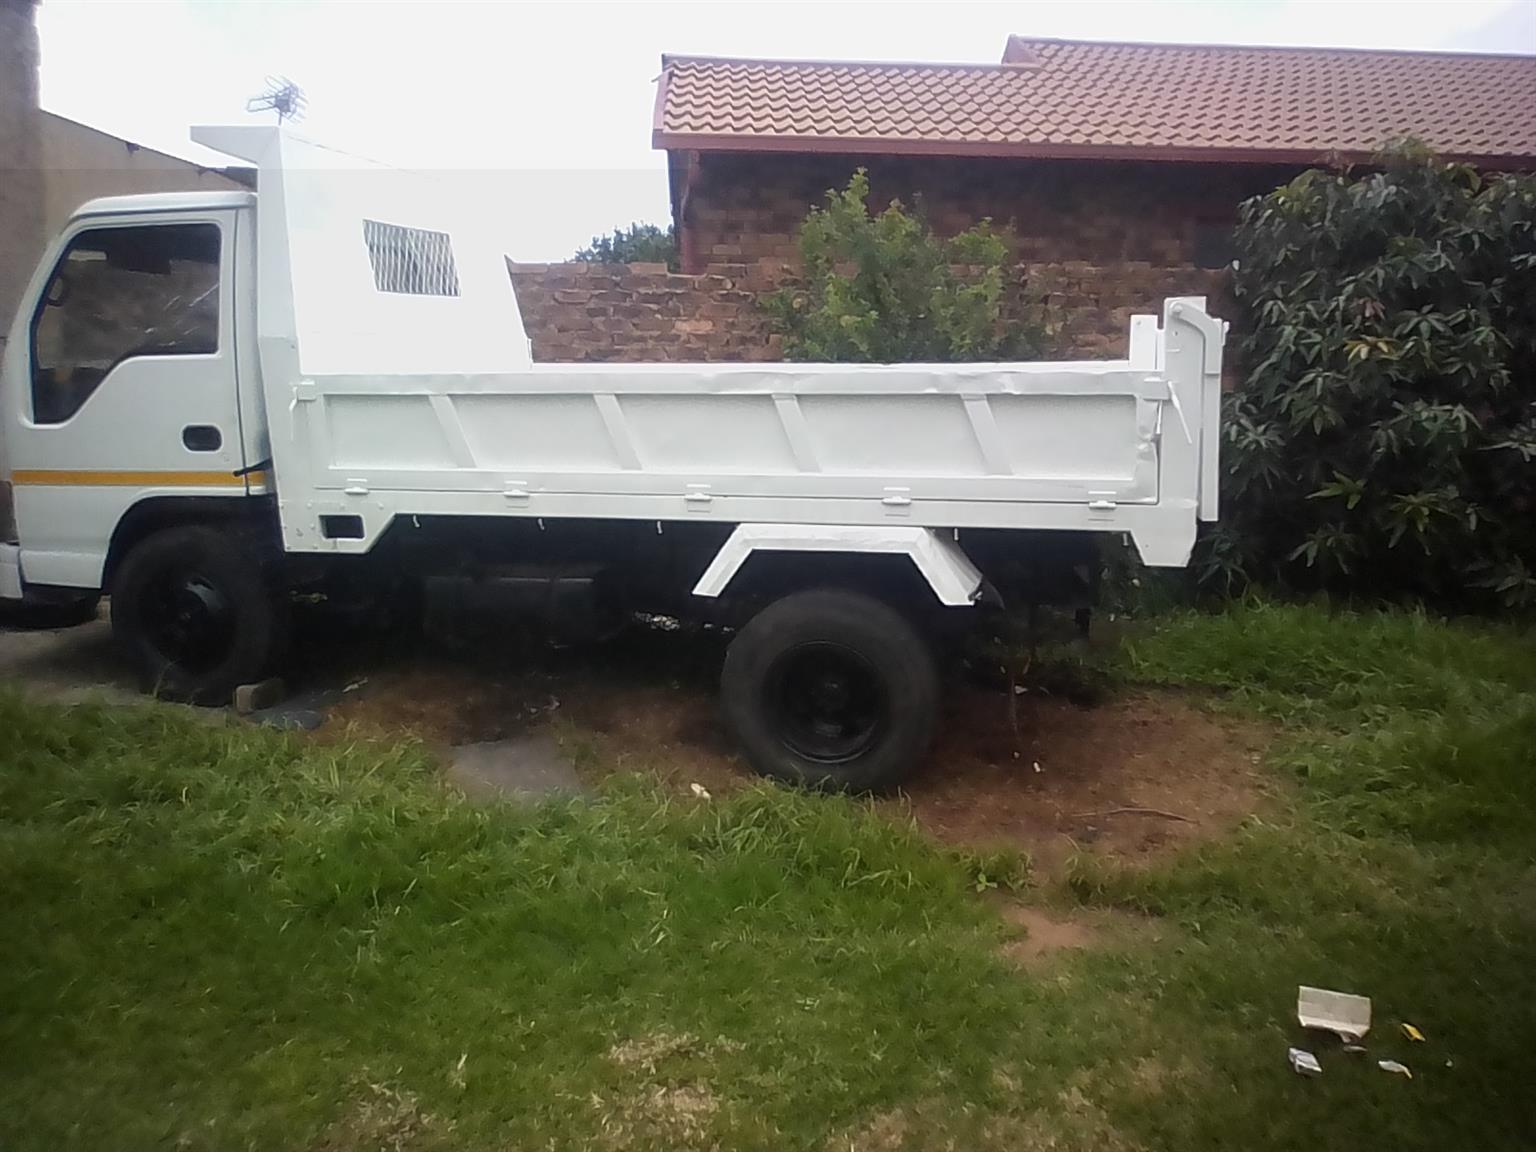 Asia Wing 3.3 diesel tipper truck for sale in Ebony Park, Midrand